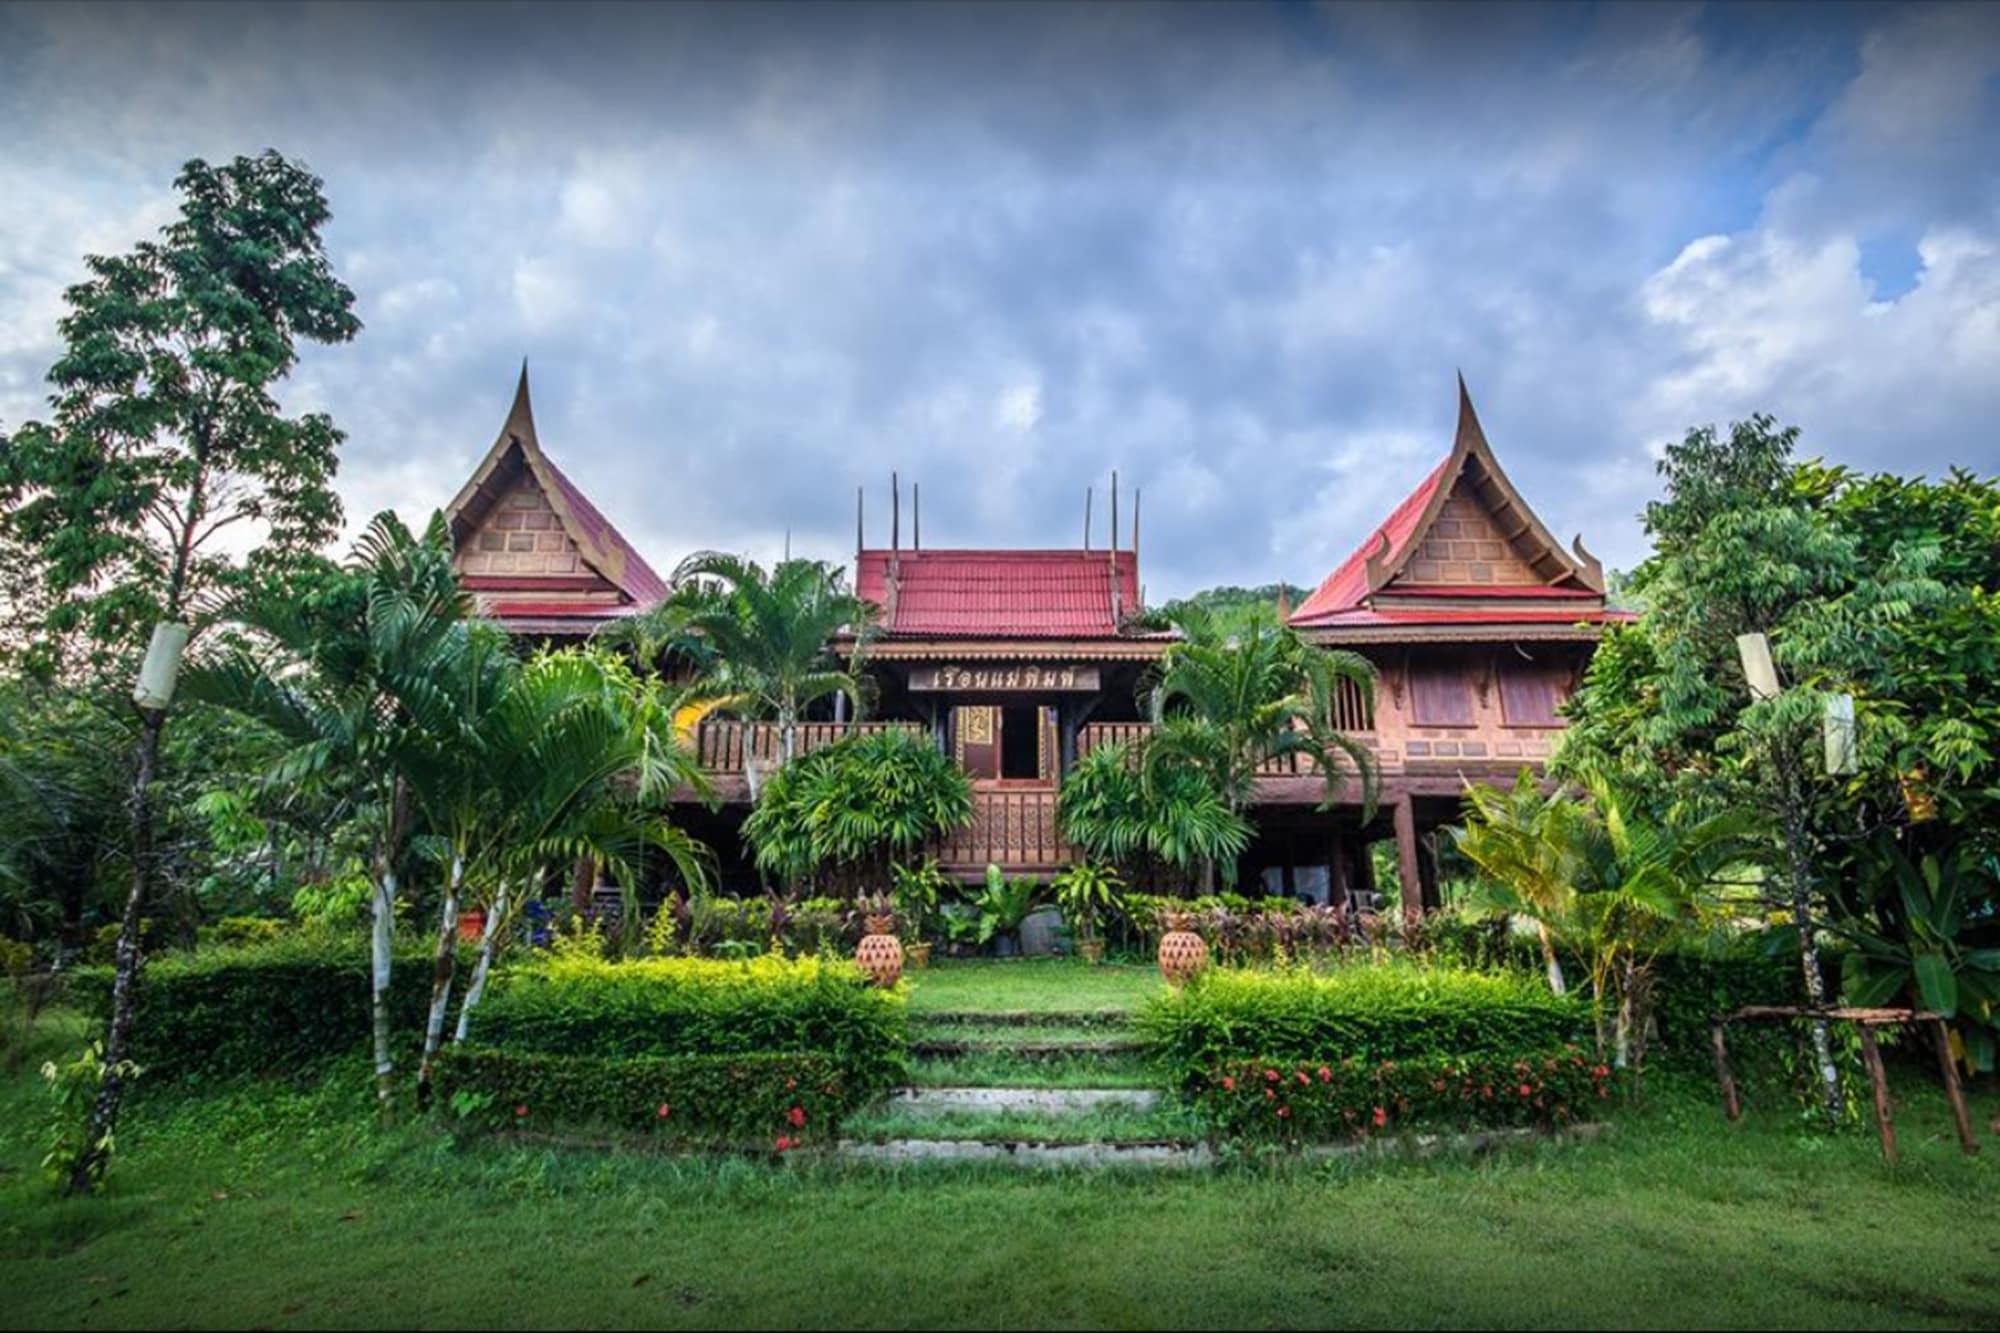 Lomrak Resort, Suan Phung